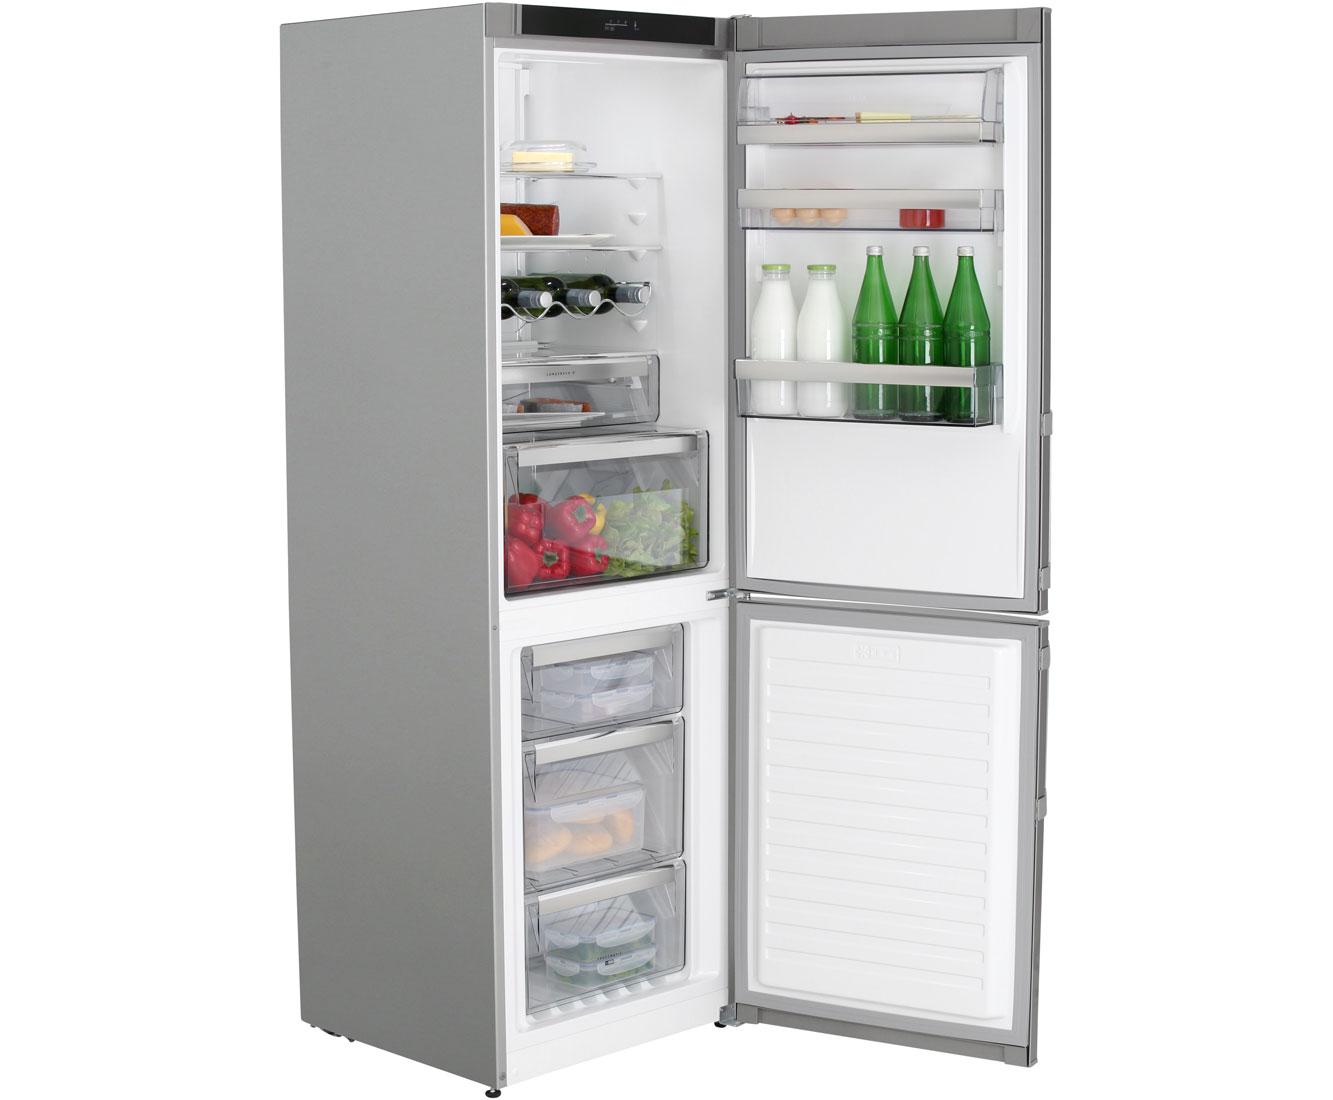 Aeg Kühlschrank Preise : Aeg santo kühlschrank kaufen side by side kühlschränke online